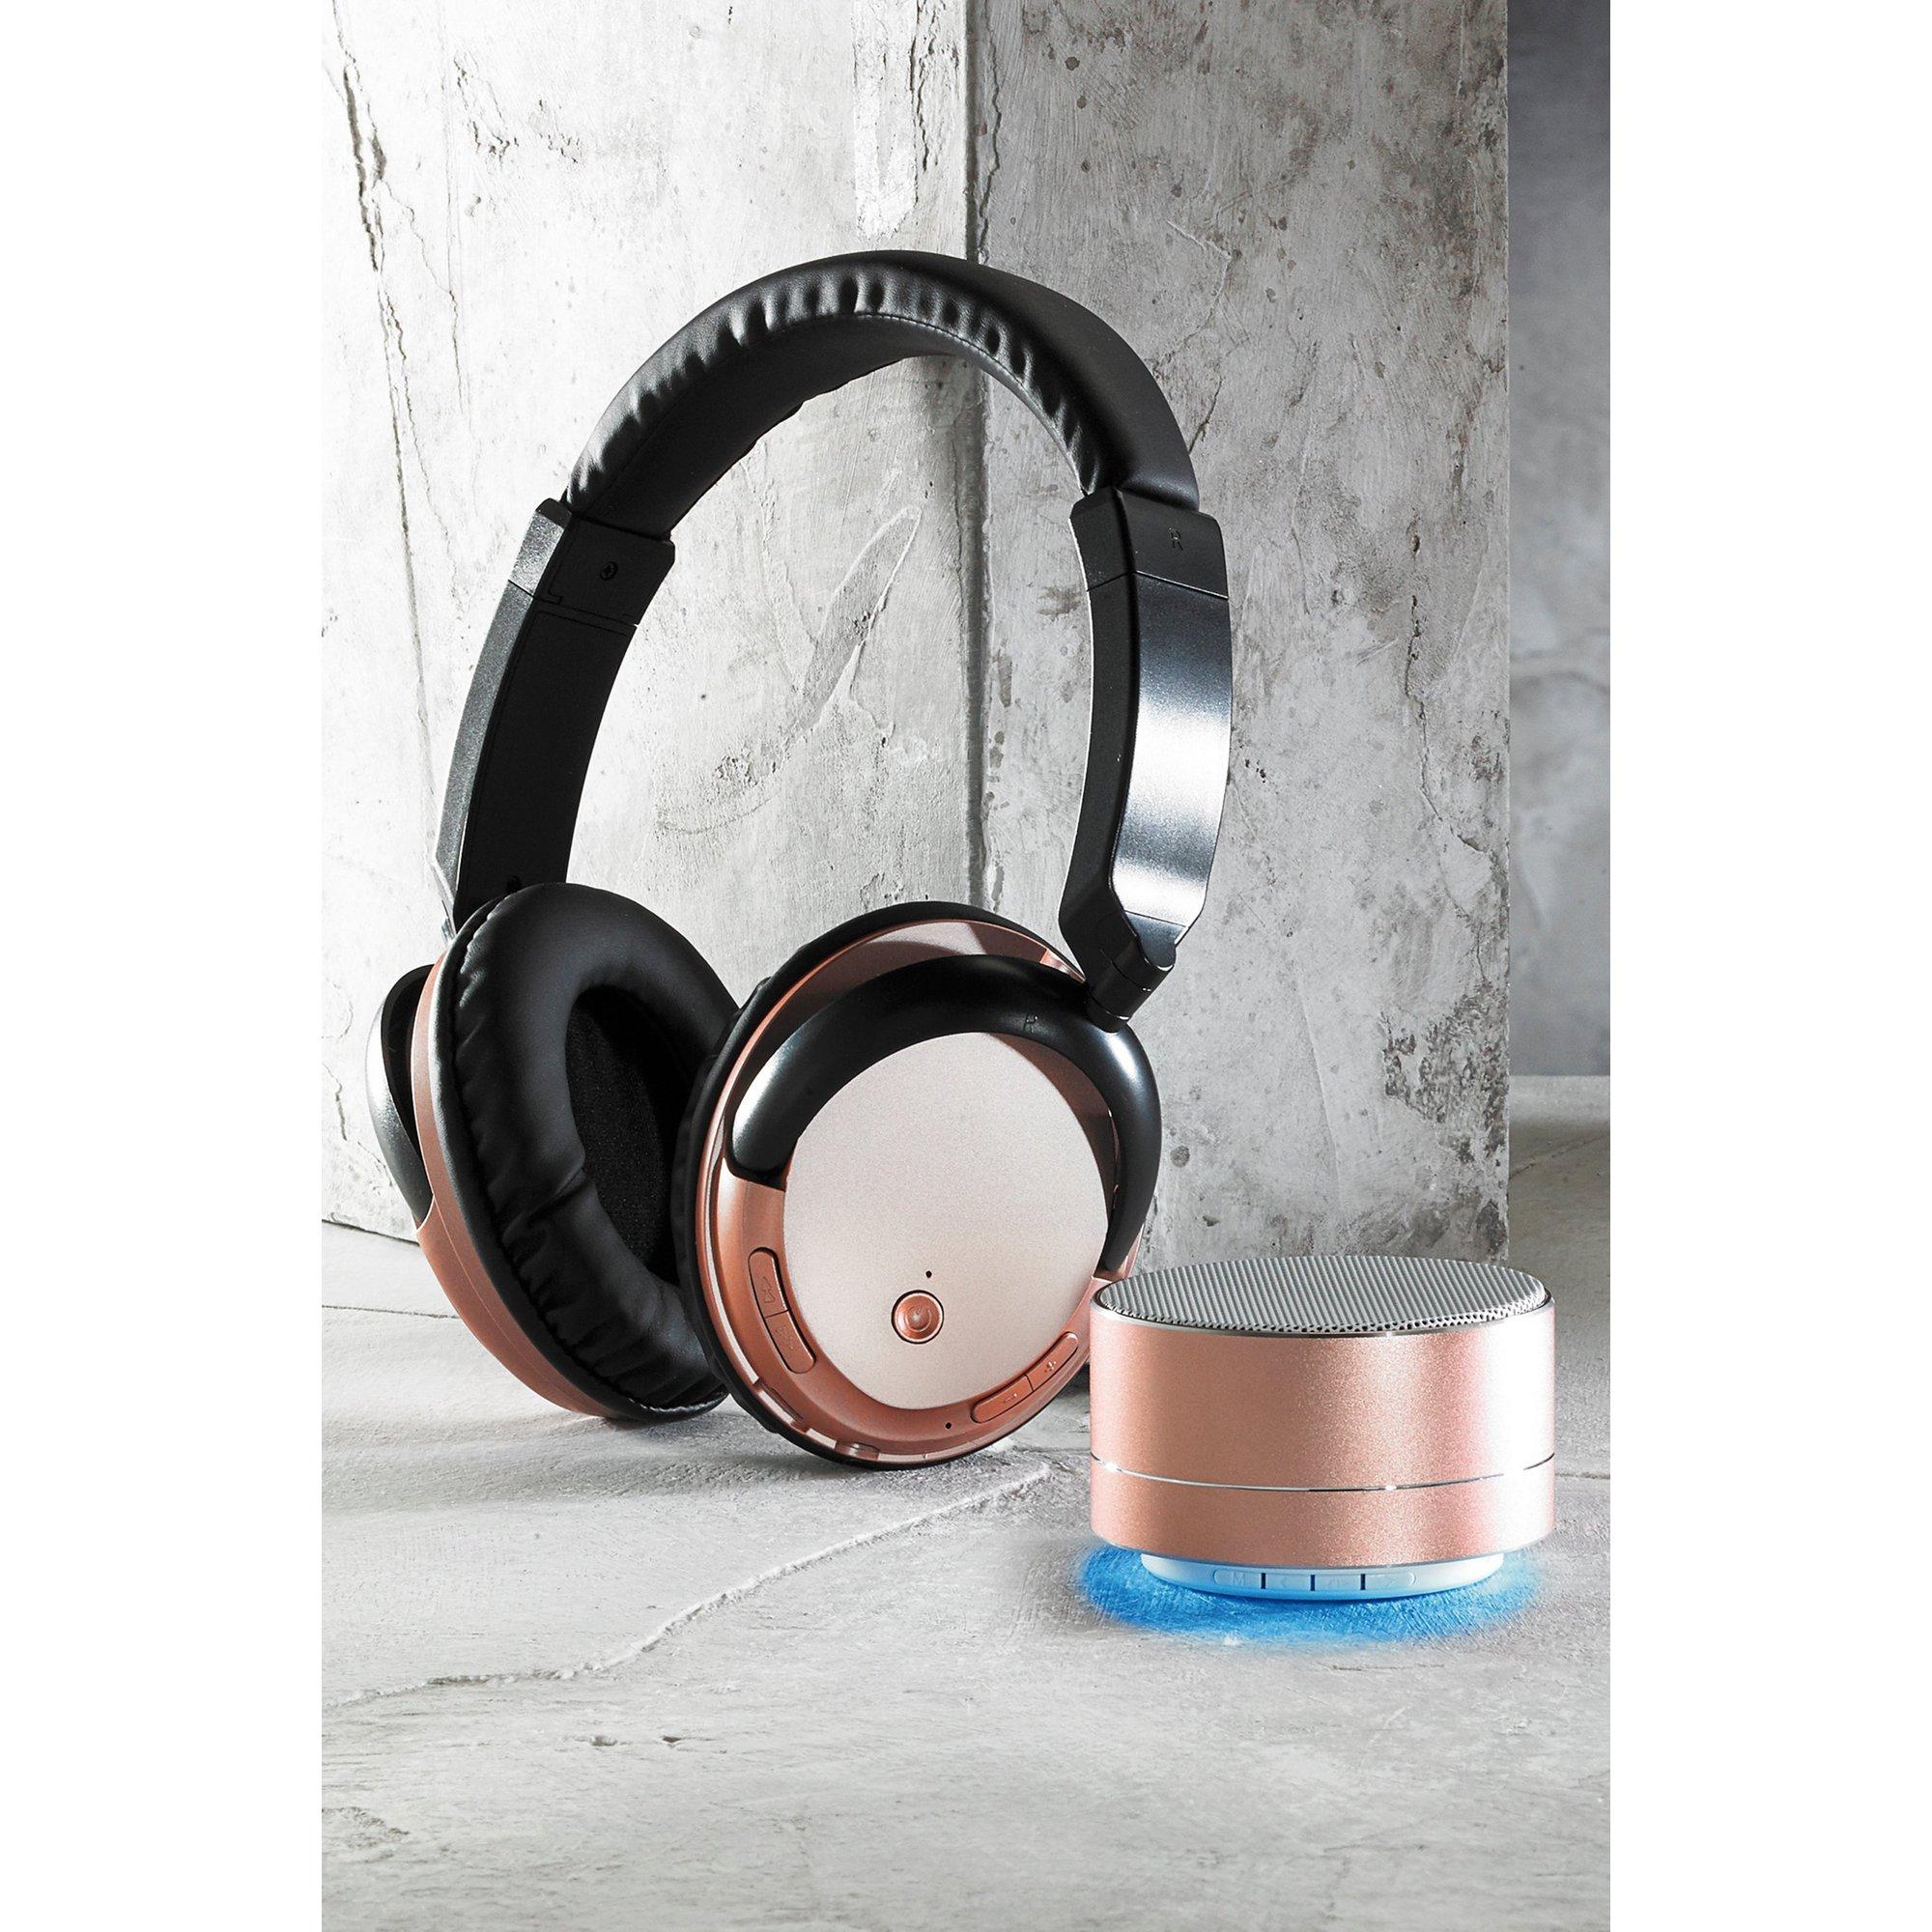 Image of Bluetooth Audio Set